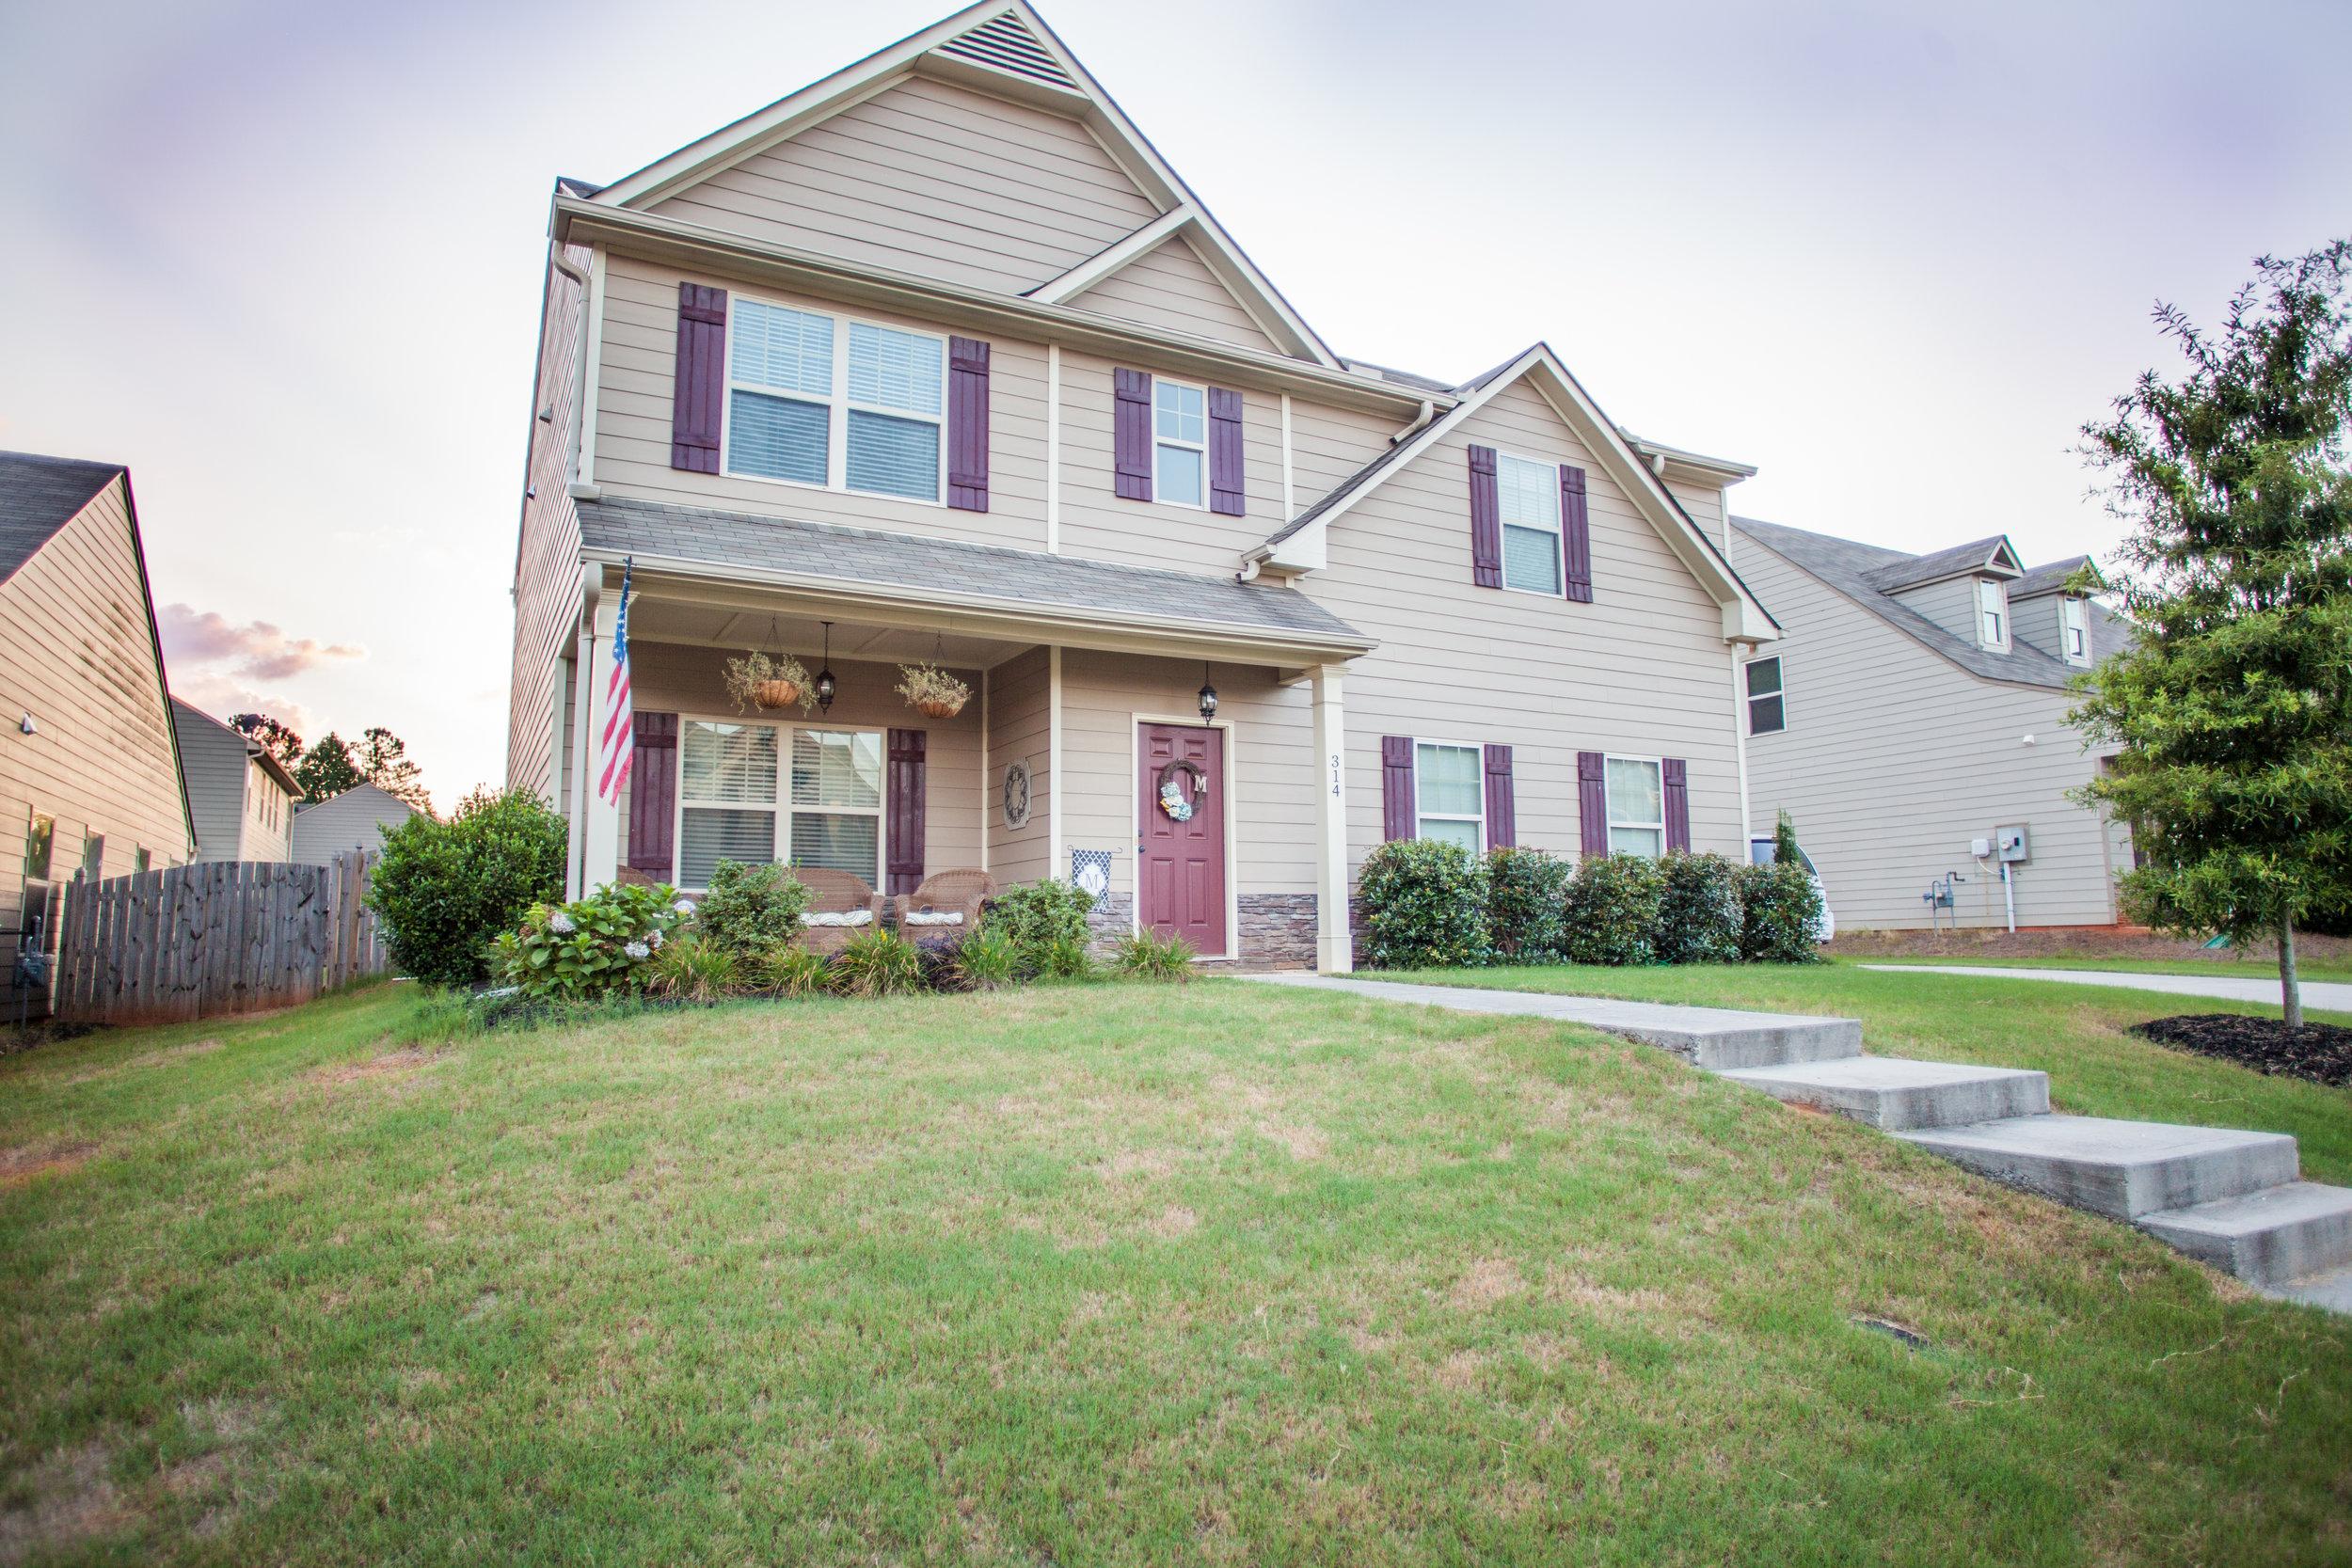 woodstock-ga-house-for-sale-wingard-real-estate-under-300k-64.jpg